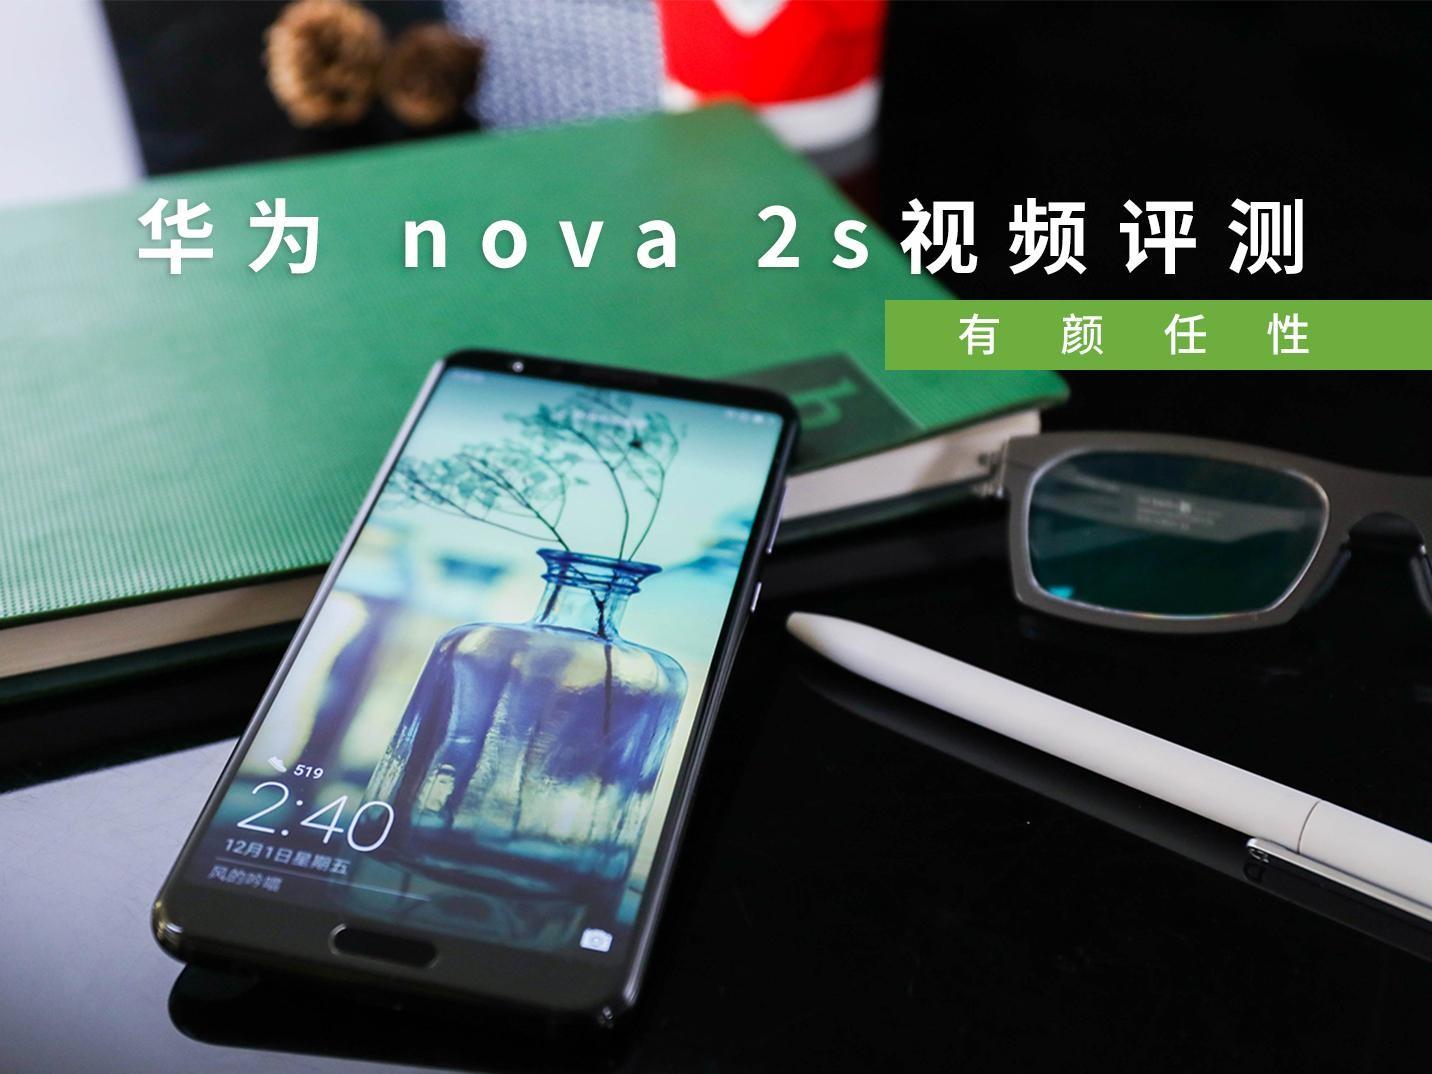 HUAWEI nova 2s视频评测 有颜任性